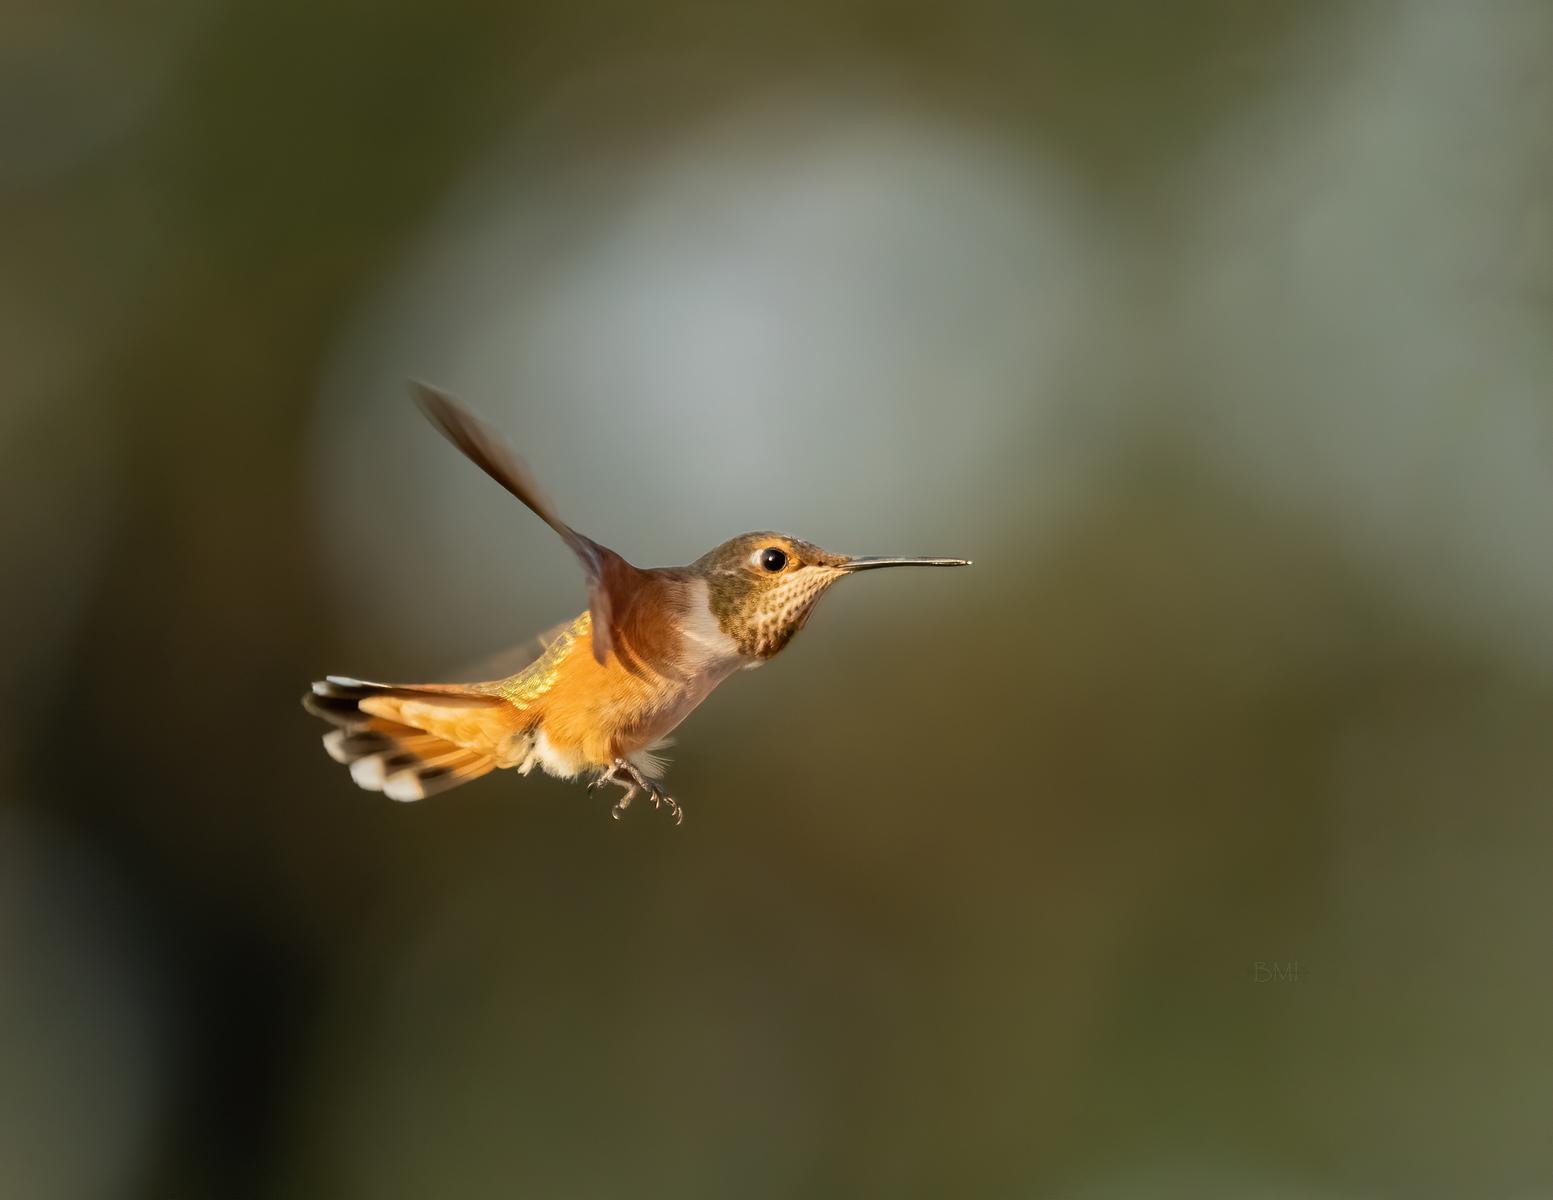 IMAGE: https://photos.smugmug.com/Beautyinthetreesandintheair/Humminngbirds-2020/i-Qwq68t6/0/0fbd32ff/X3/Rufous%20hummingbird_C_8-31-2020-43-X3.jpg